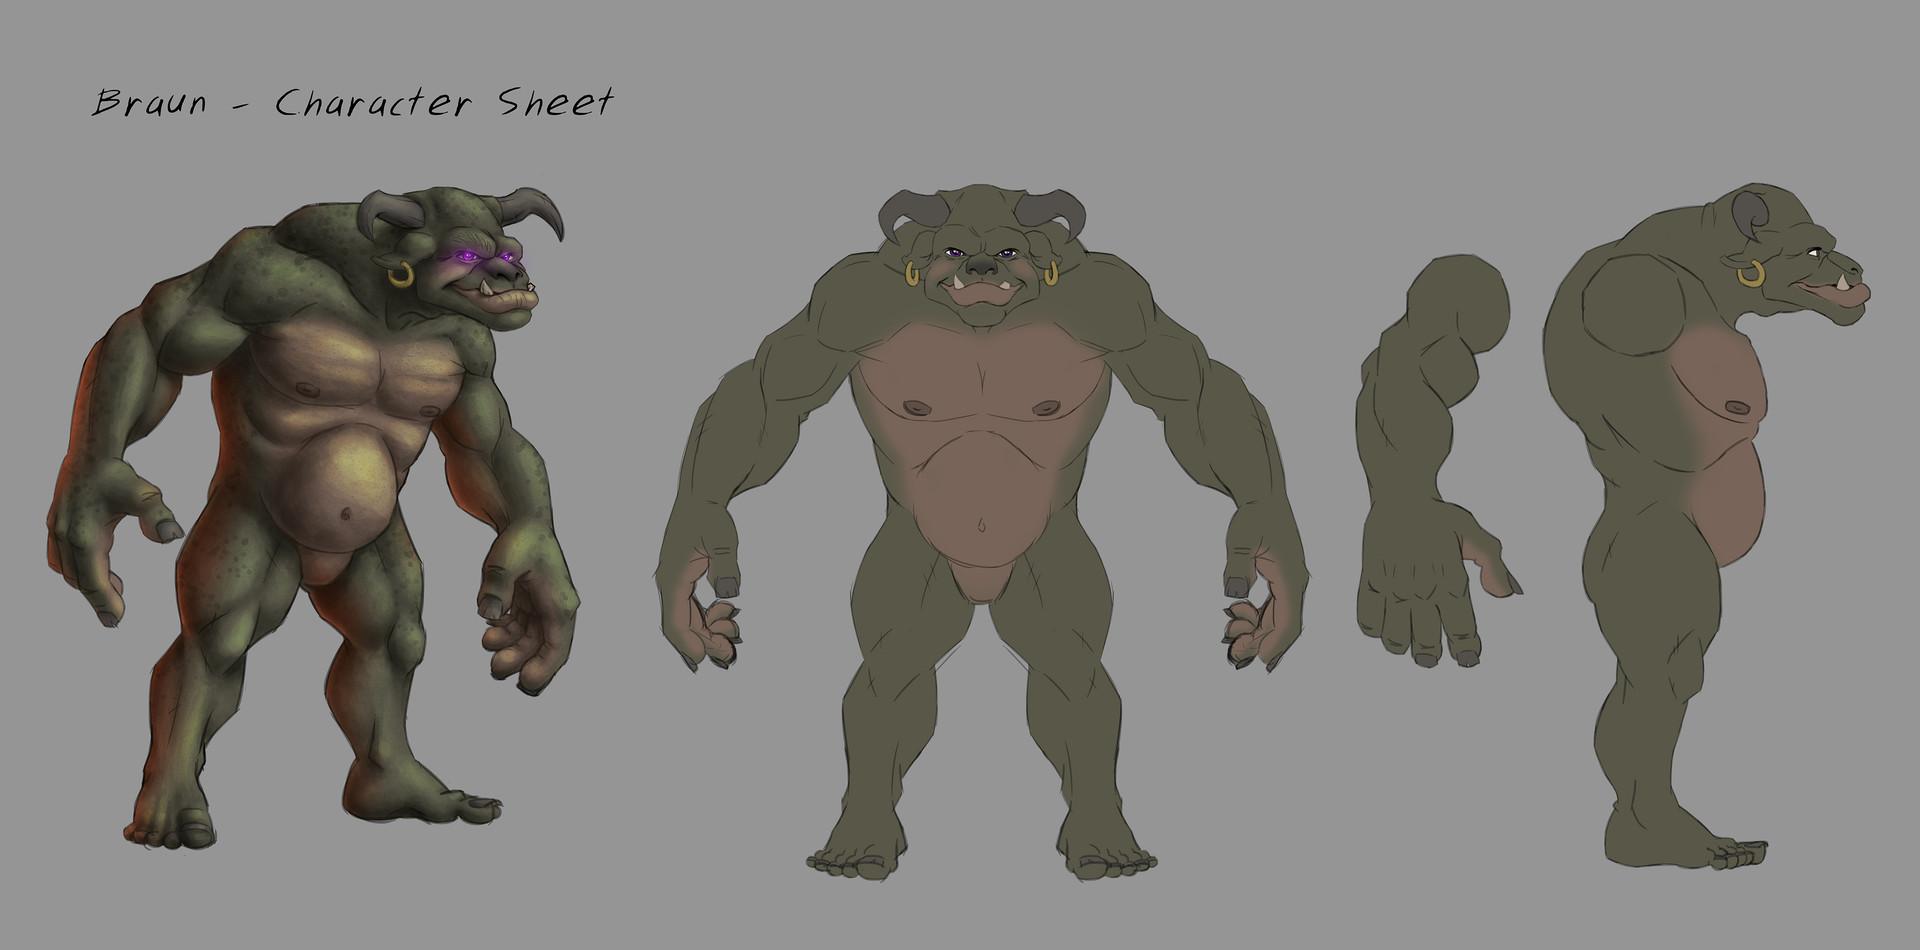 Bronn - Concept/CharacterSheet